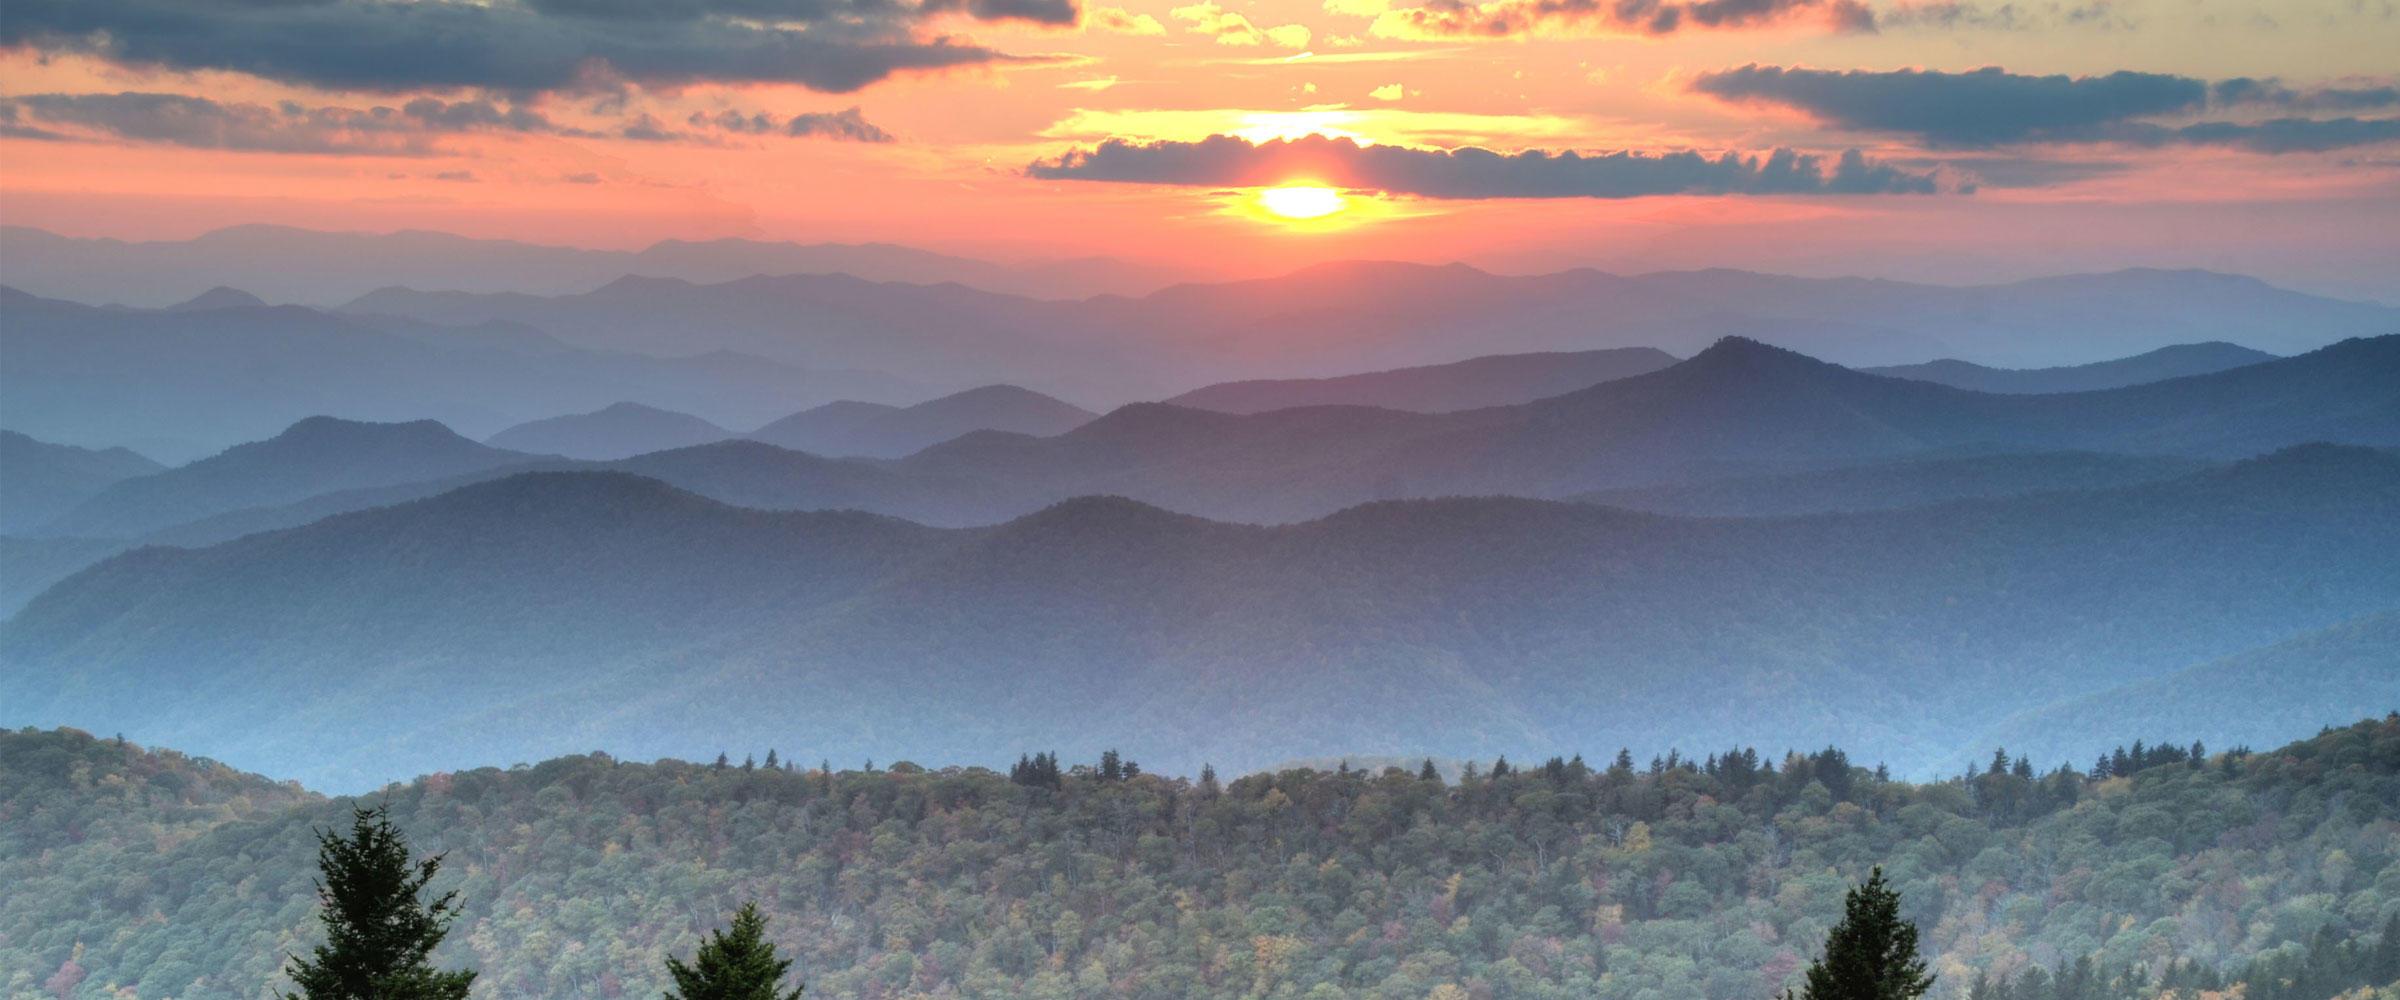 Blue Ridge Mountains_Mary Anne Baker_Flickr CC